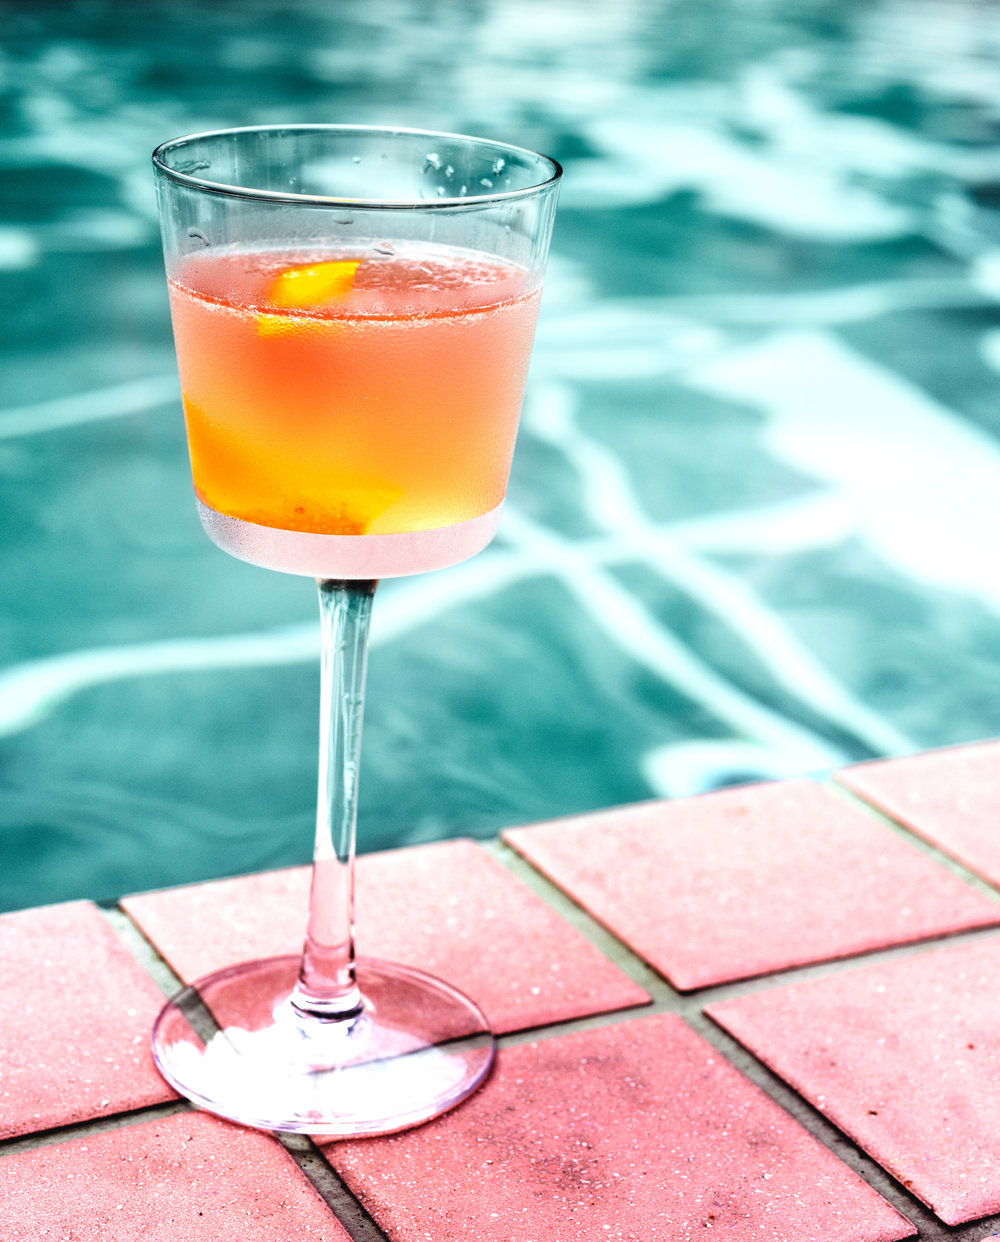 alcoholic-alcoholic-beverage-aqua-1487957.JPG